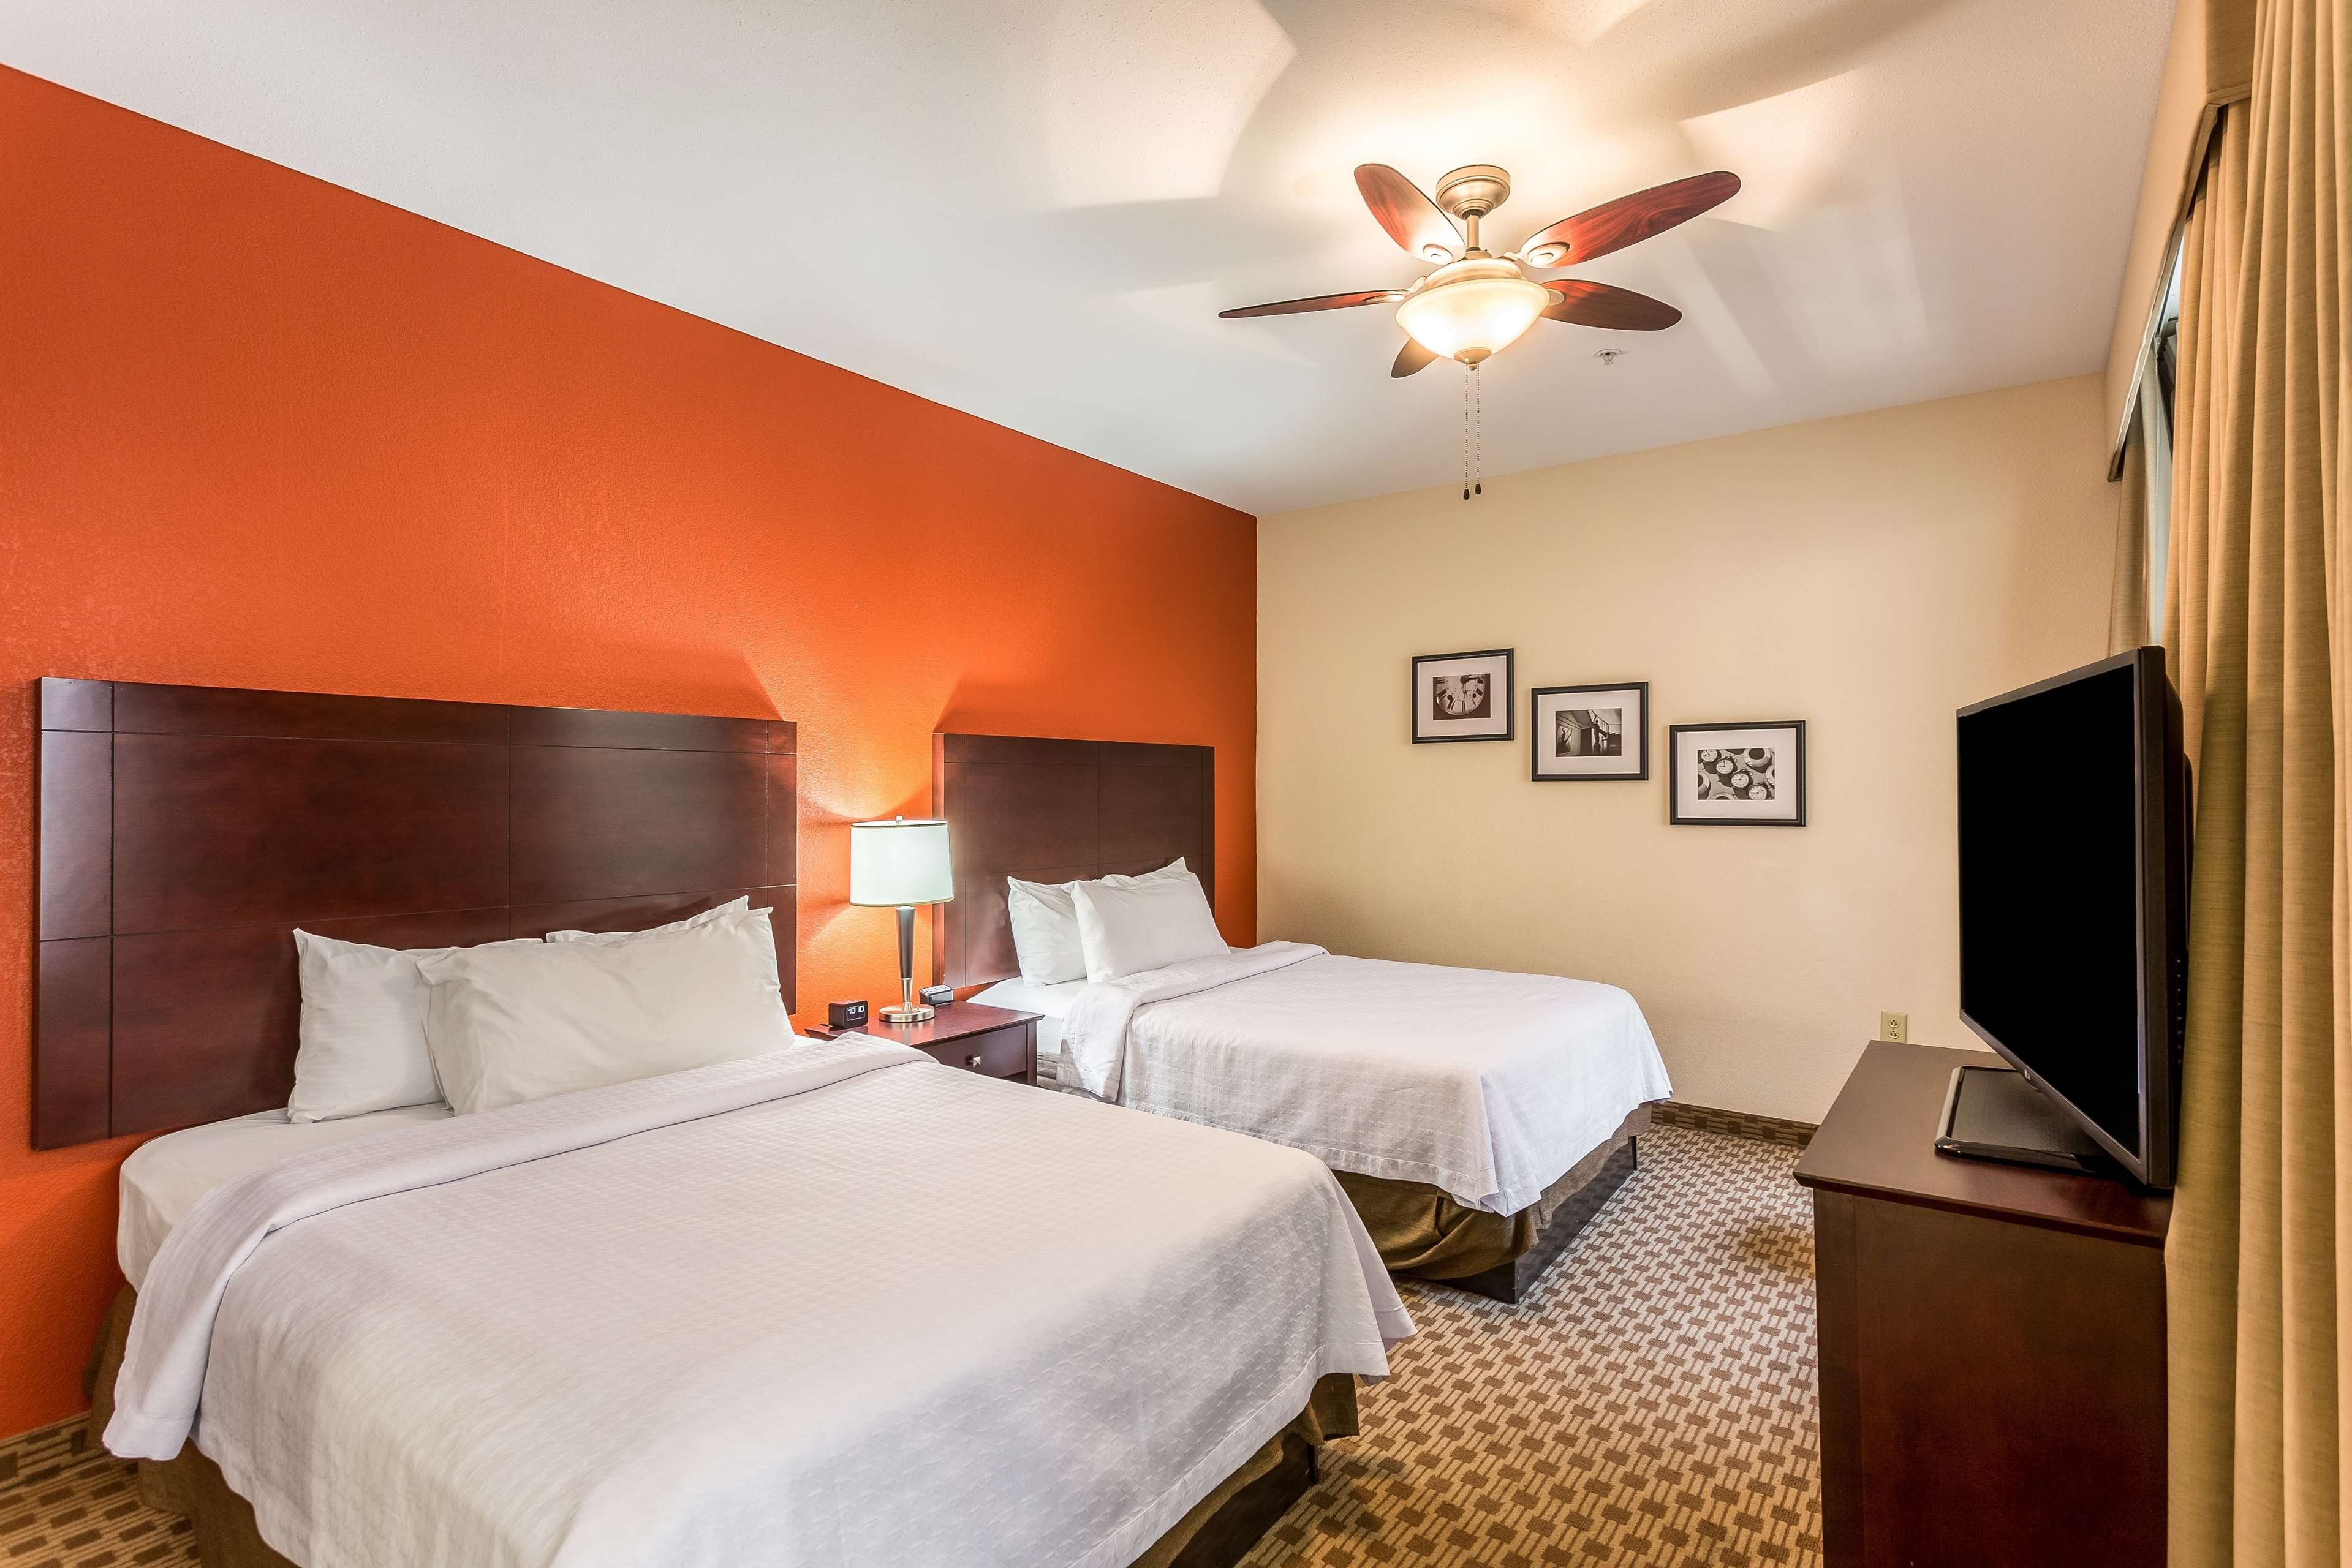 Homewood Suites by Hilton Nashville-Downtown image 11